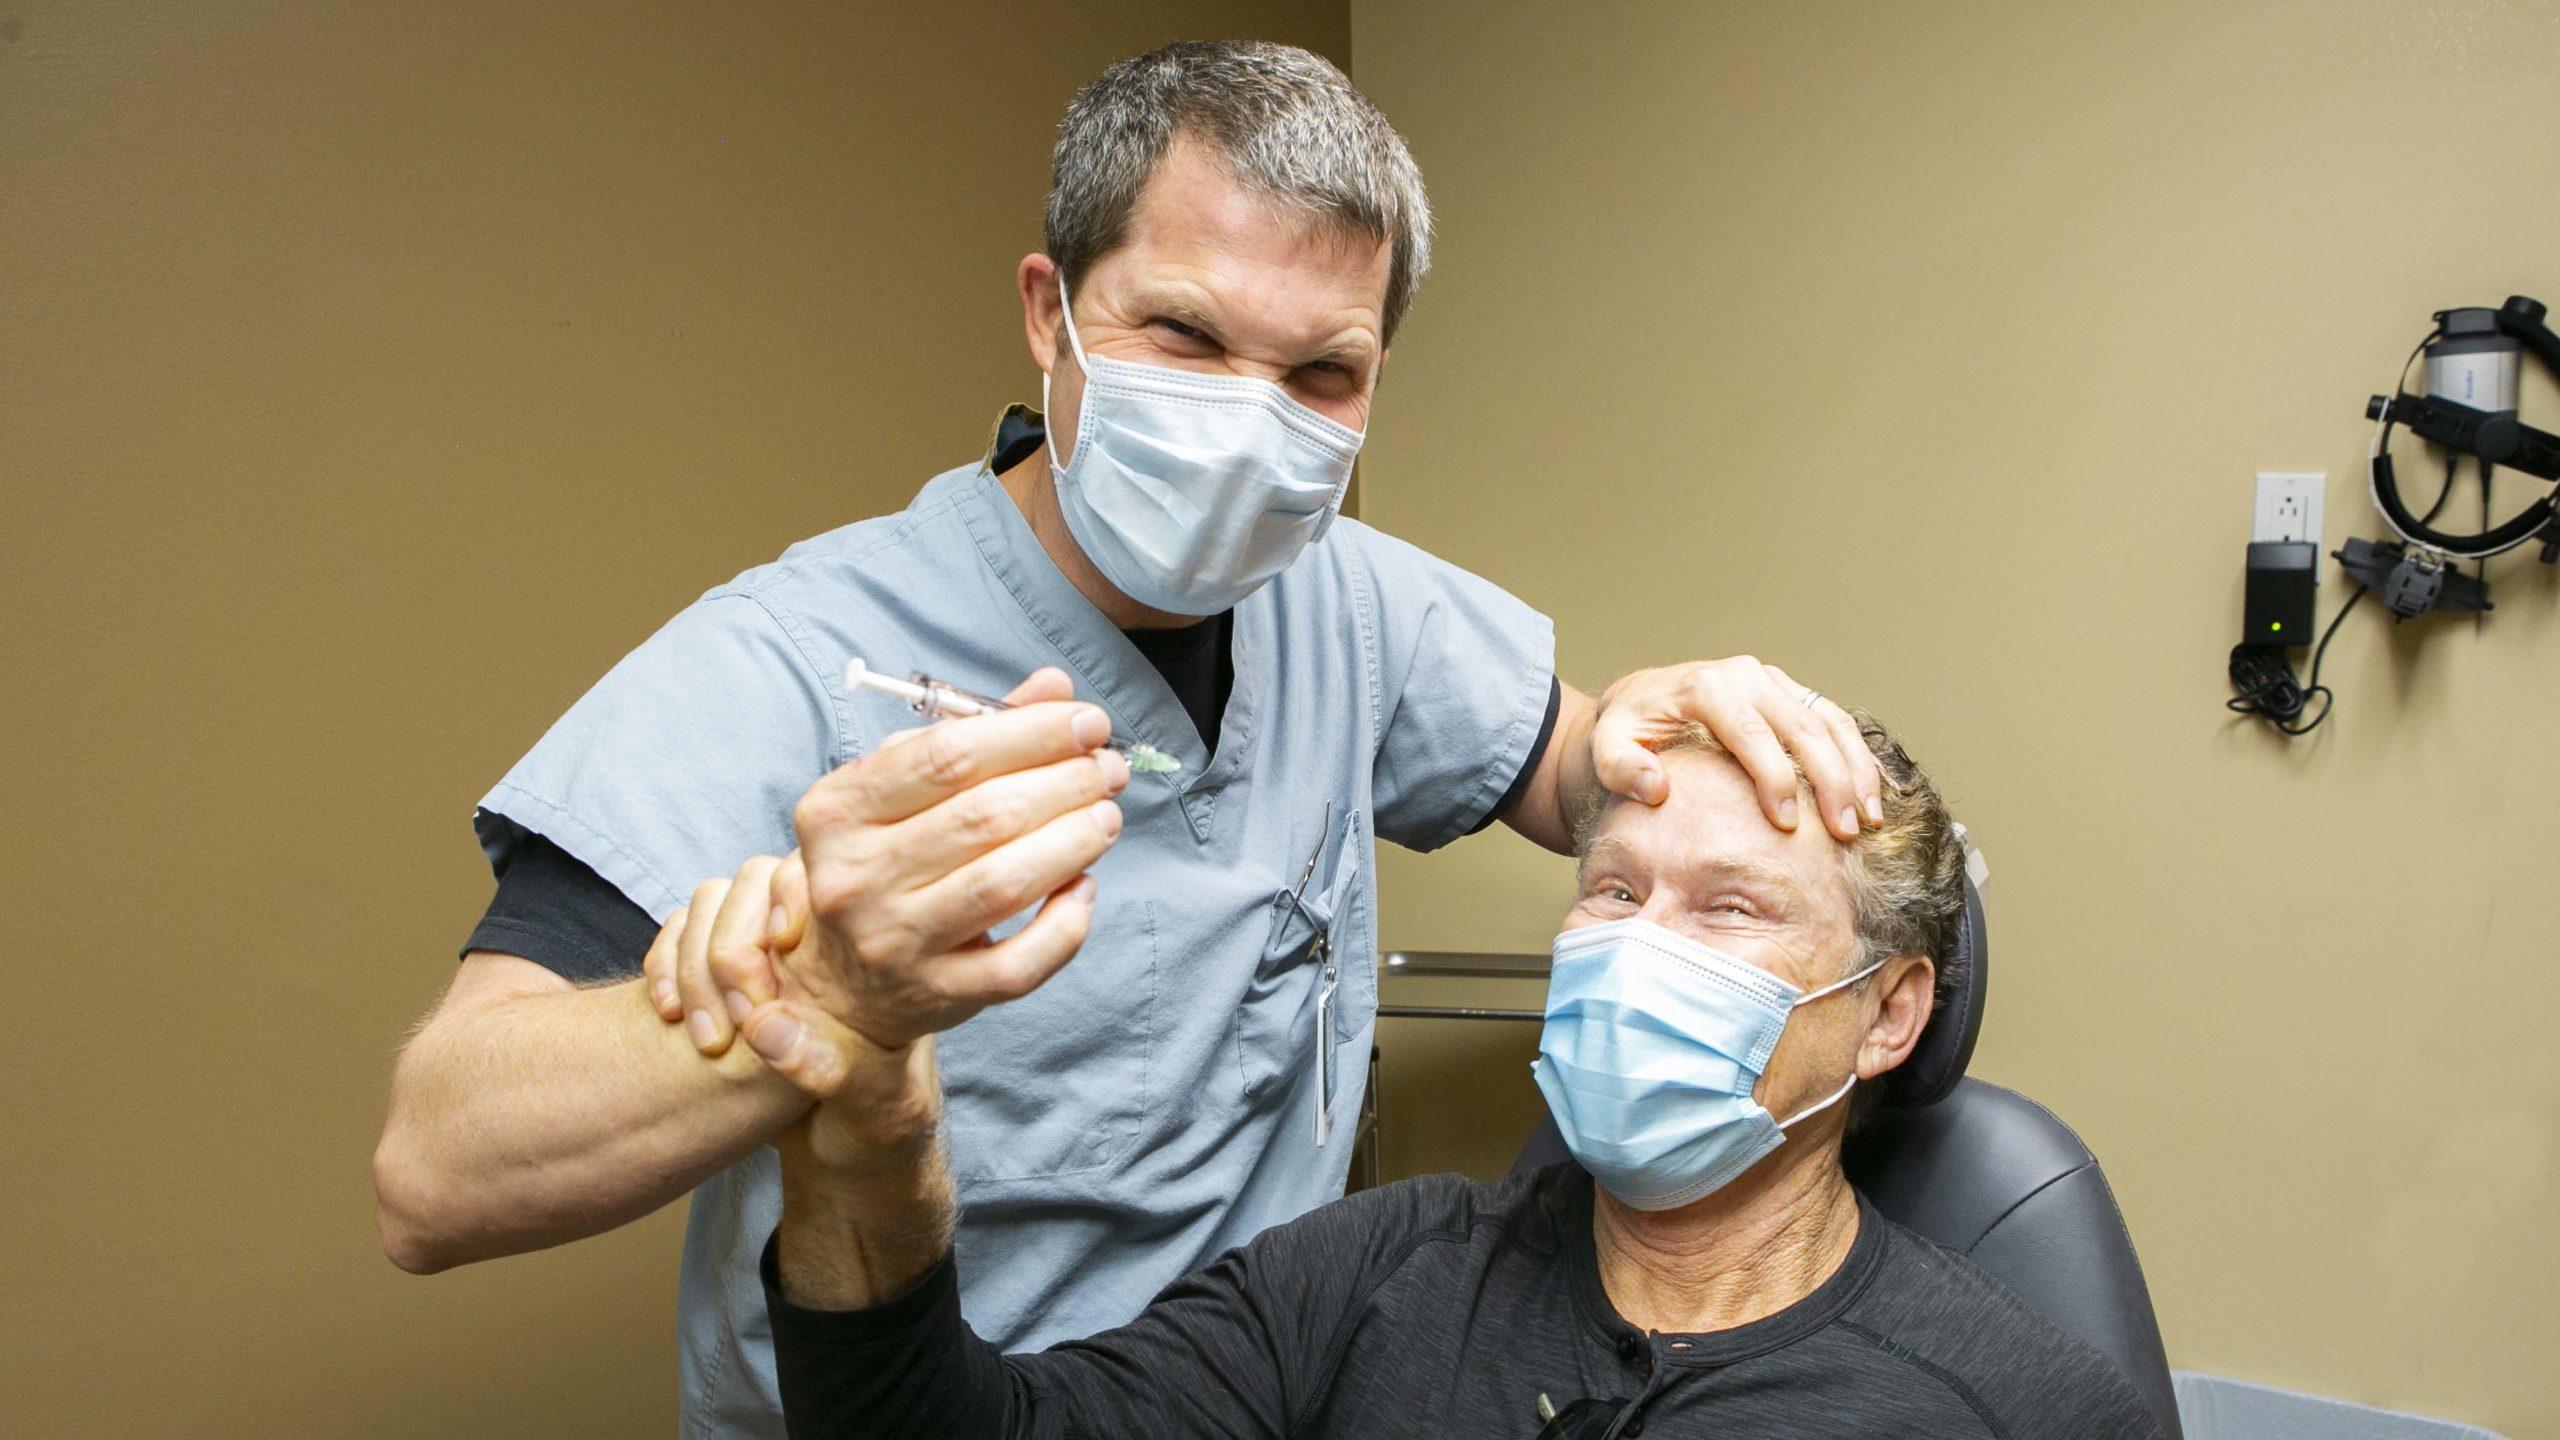 A Dose of Dr. E: A Peek and a Poke Inside My Eye Appointment